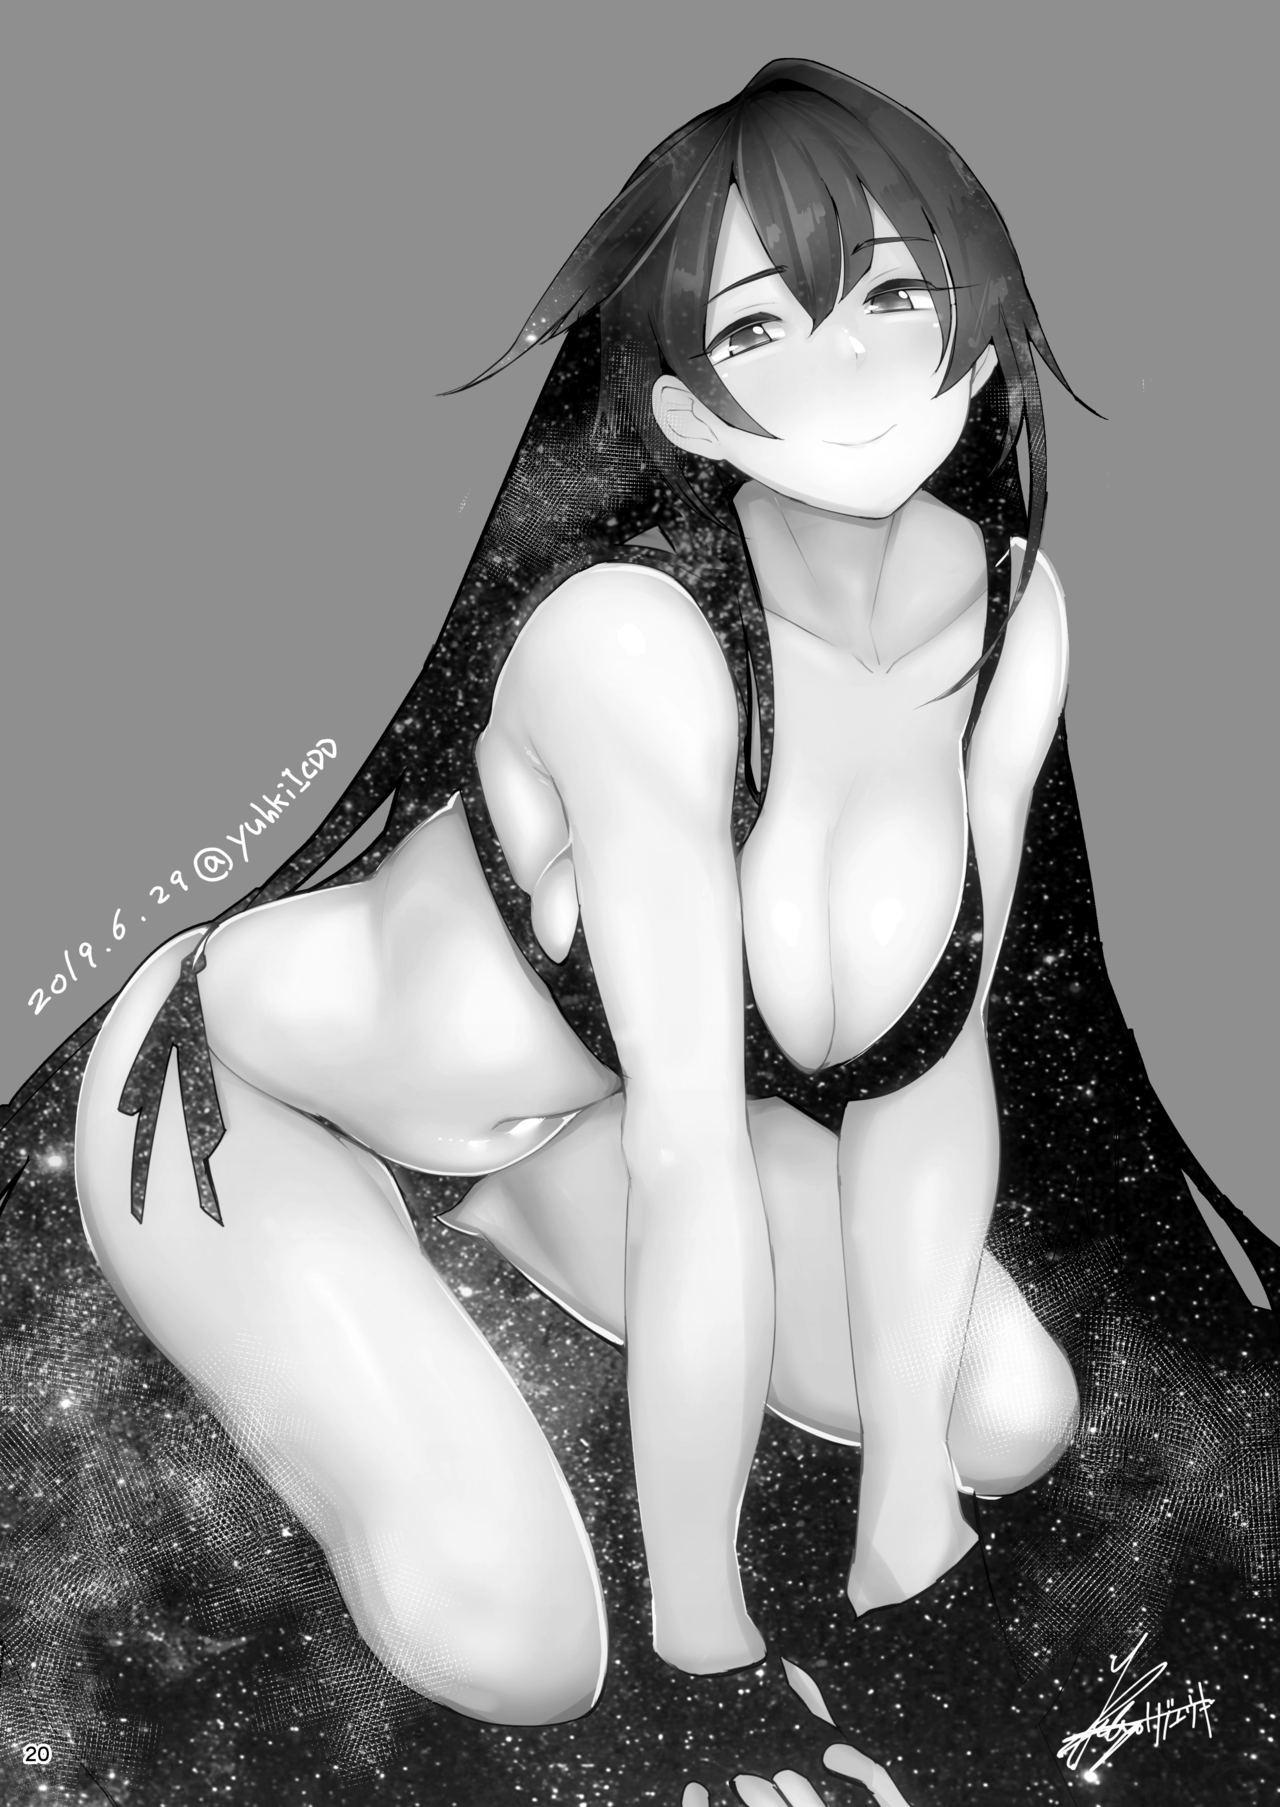 [L.G.C. (Rib:y(uhki))] Onee-chan wa Uchuu. - My elder sister is the universe. [Digital] 18